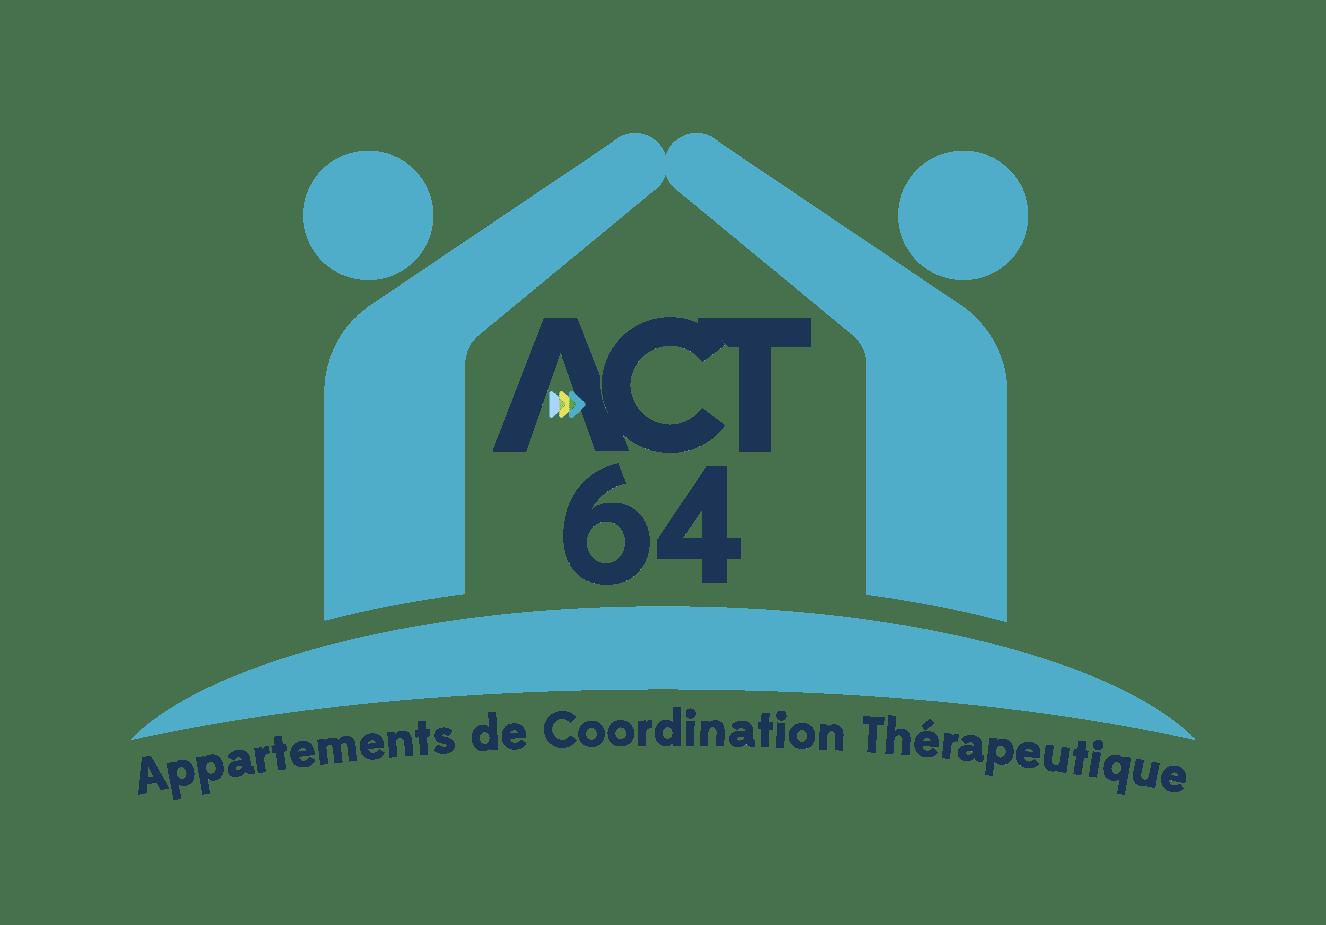 Logo ACT 64 couleur